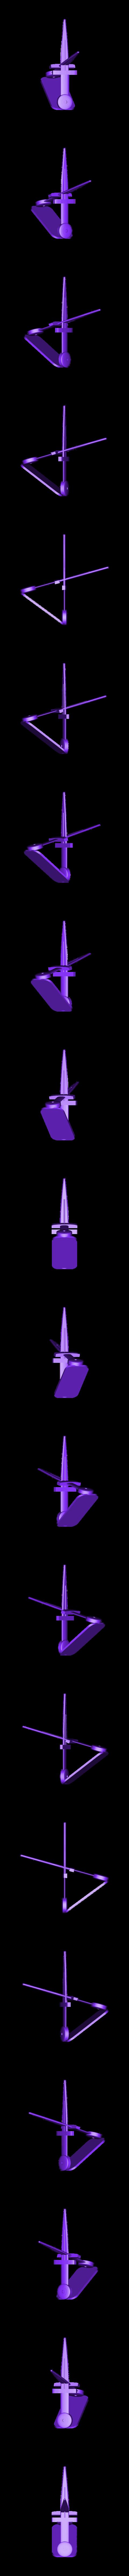 zwaard houder zwaard.stl Download STL file  sword holder • 3D printer model, jasperbaudoin